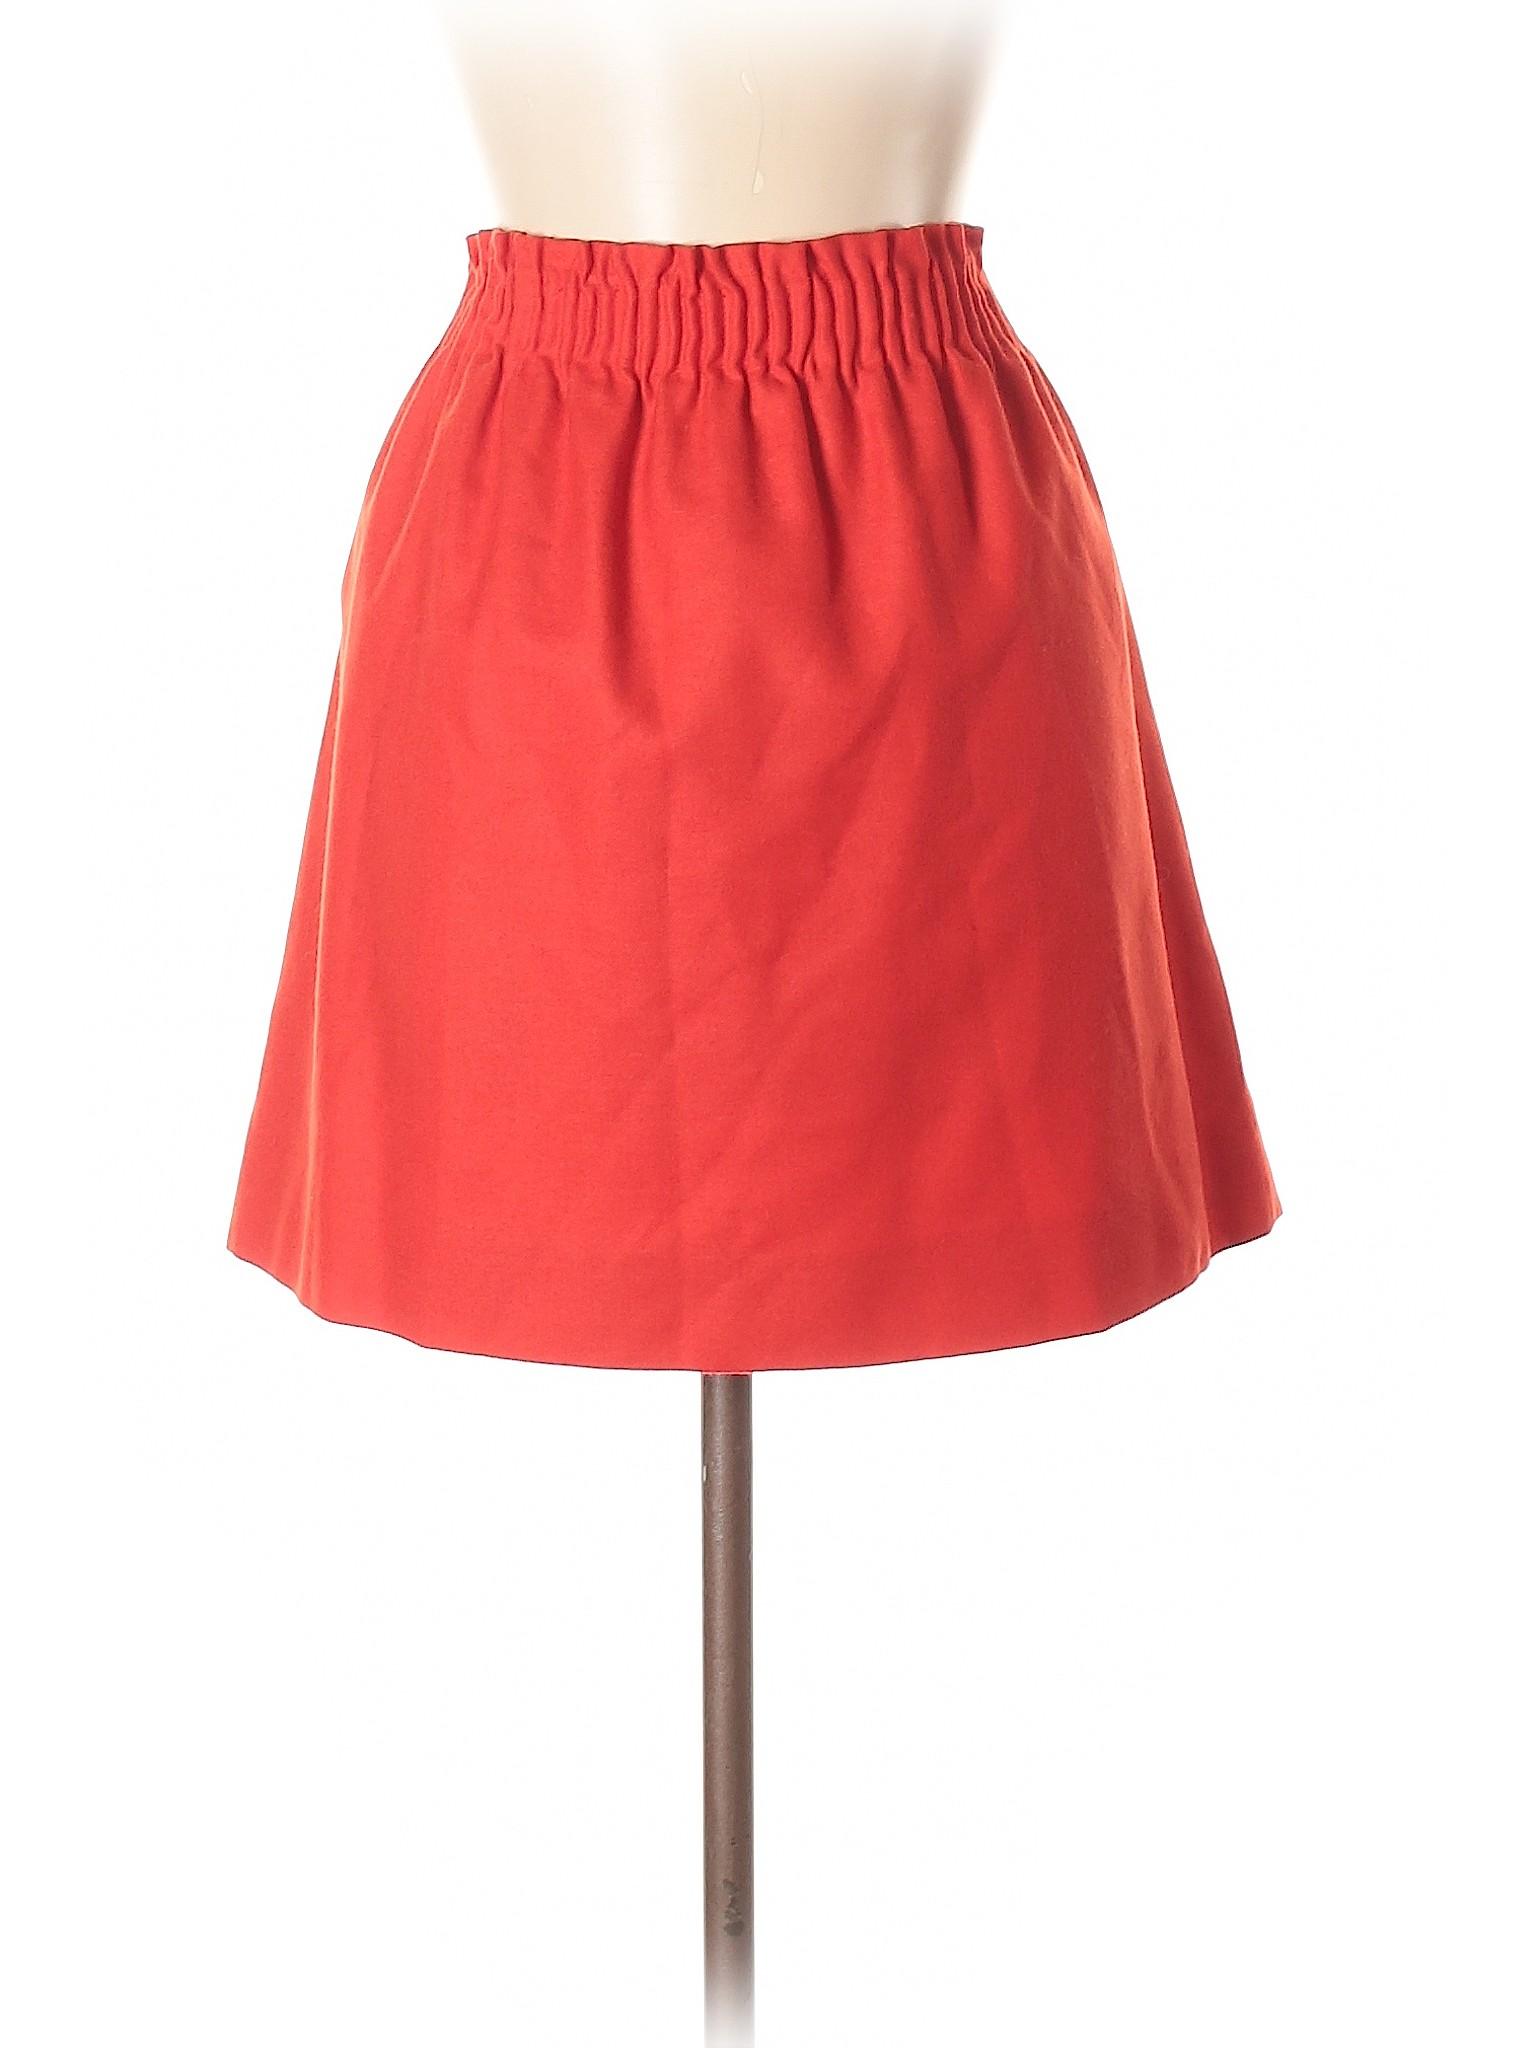 Wool Wool Skirt Skirt Boutique Boutique Boutique Boutique Skirt Wool zqTXZwxE